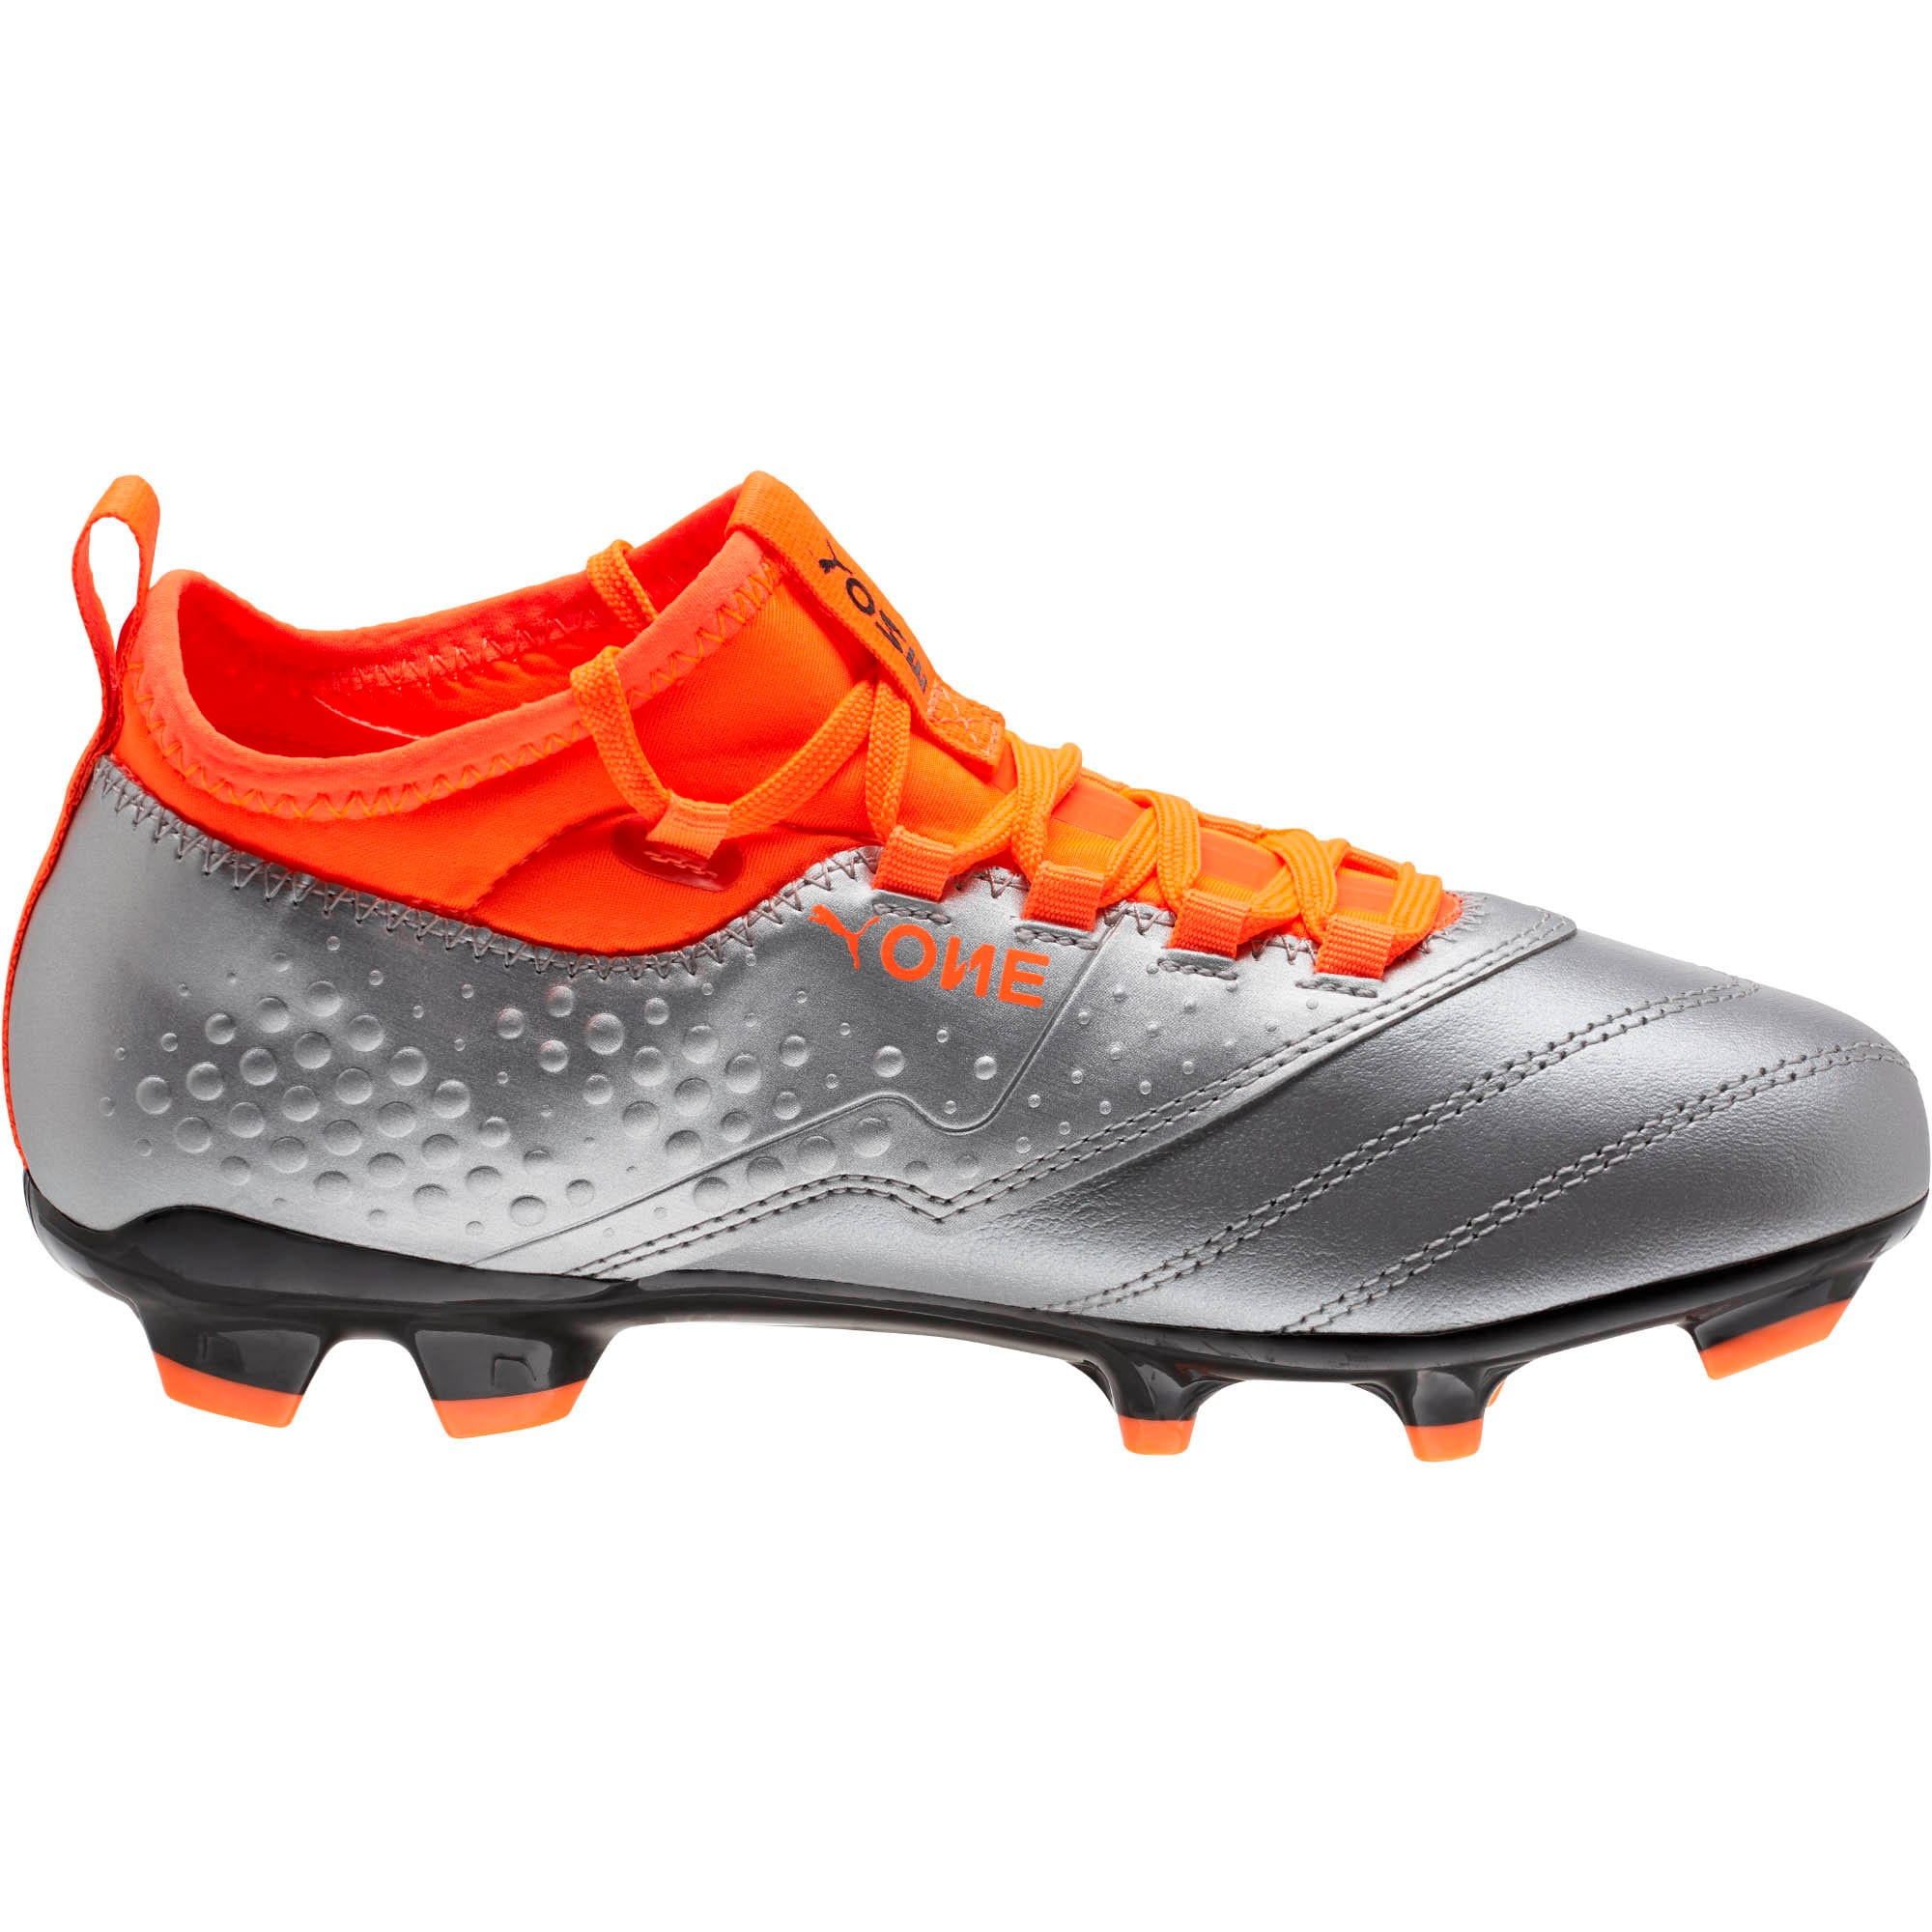 Thumbnail 3 of PUMA ONE 3 FG Soccer Cleats JR, Silver-Orange-Black, medium